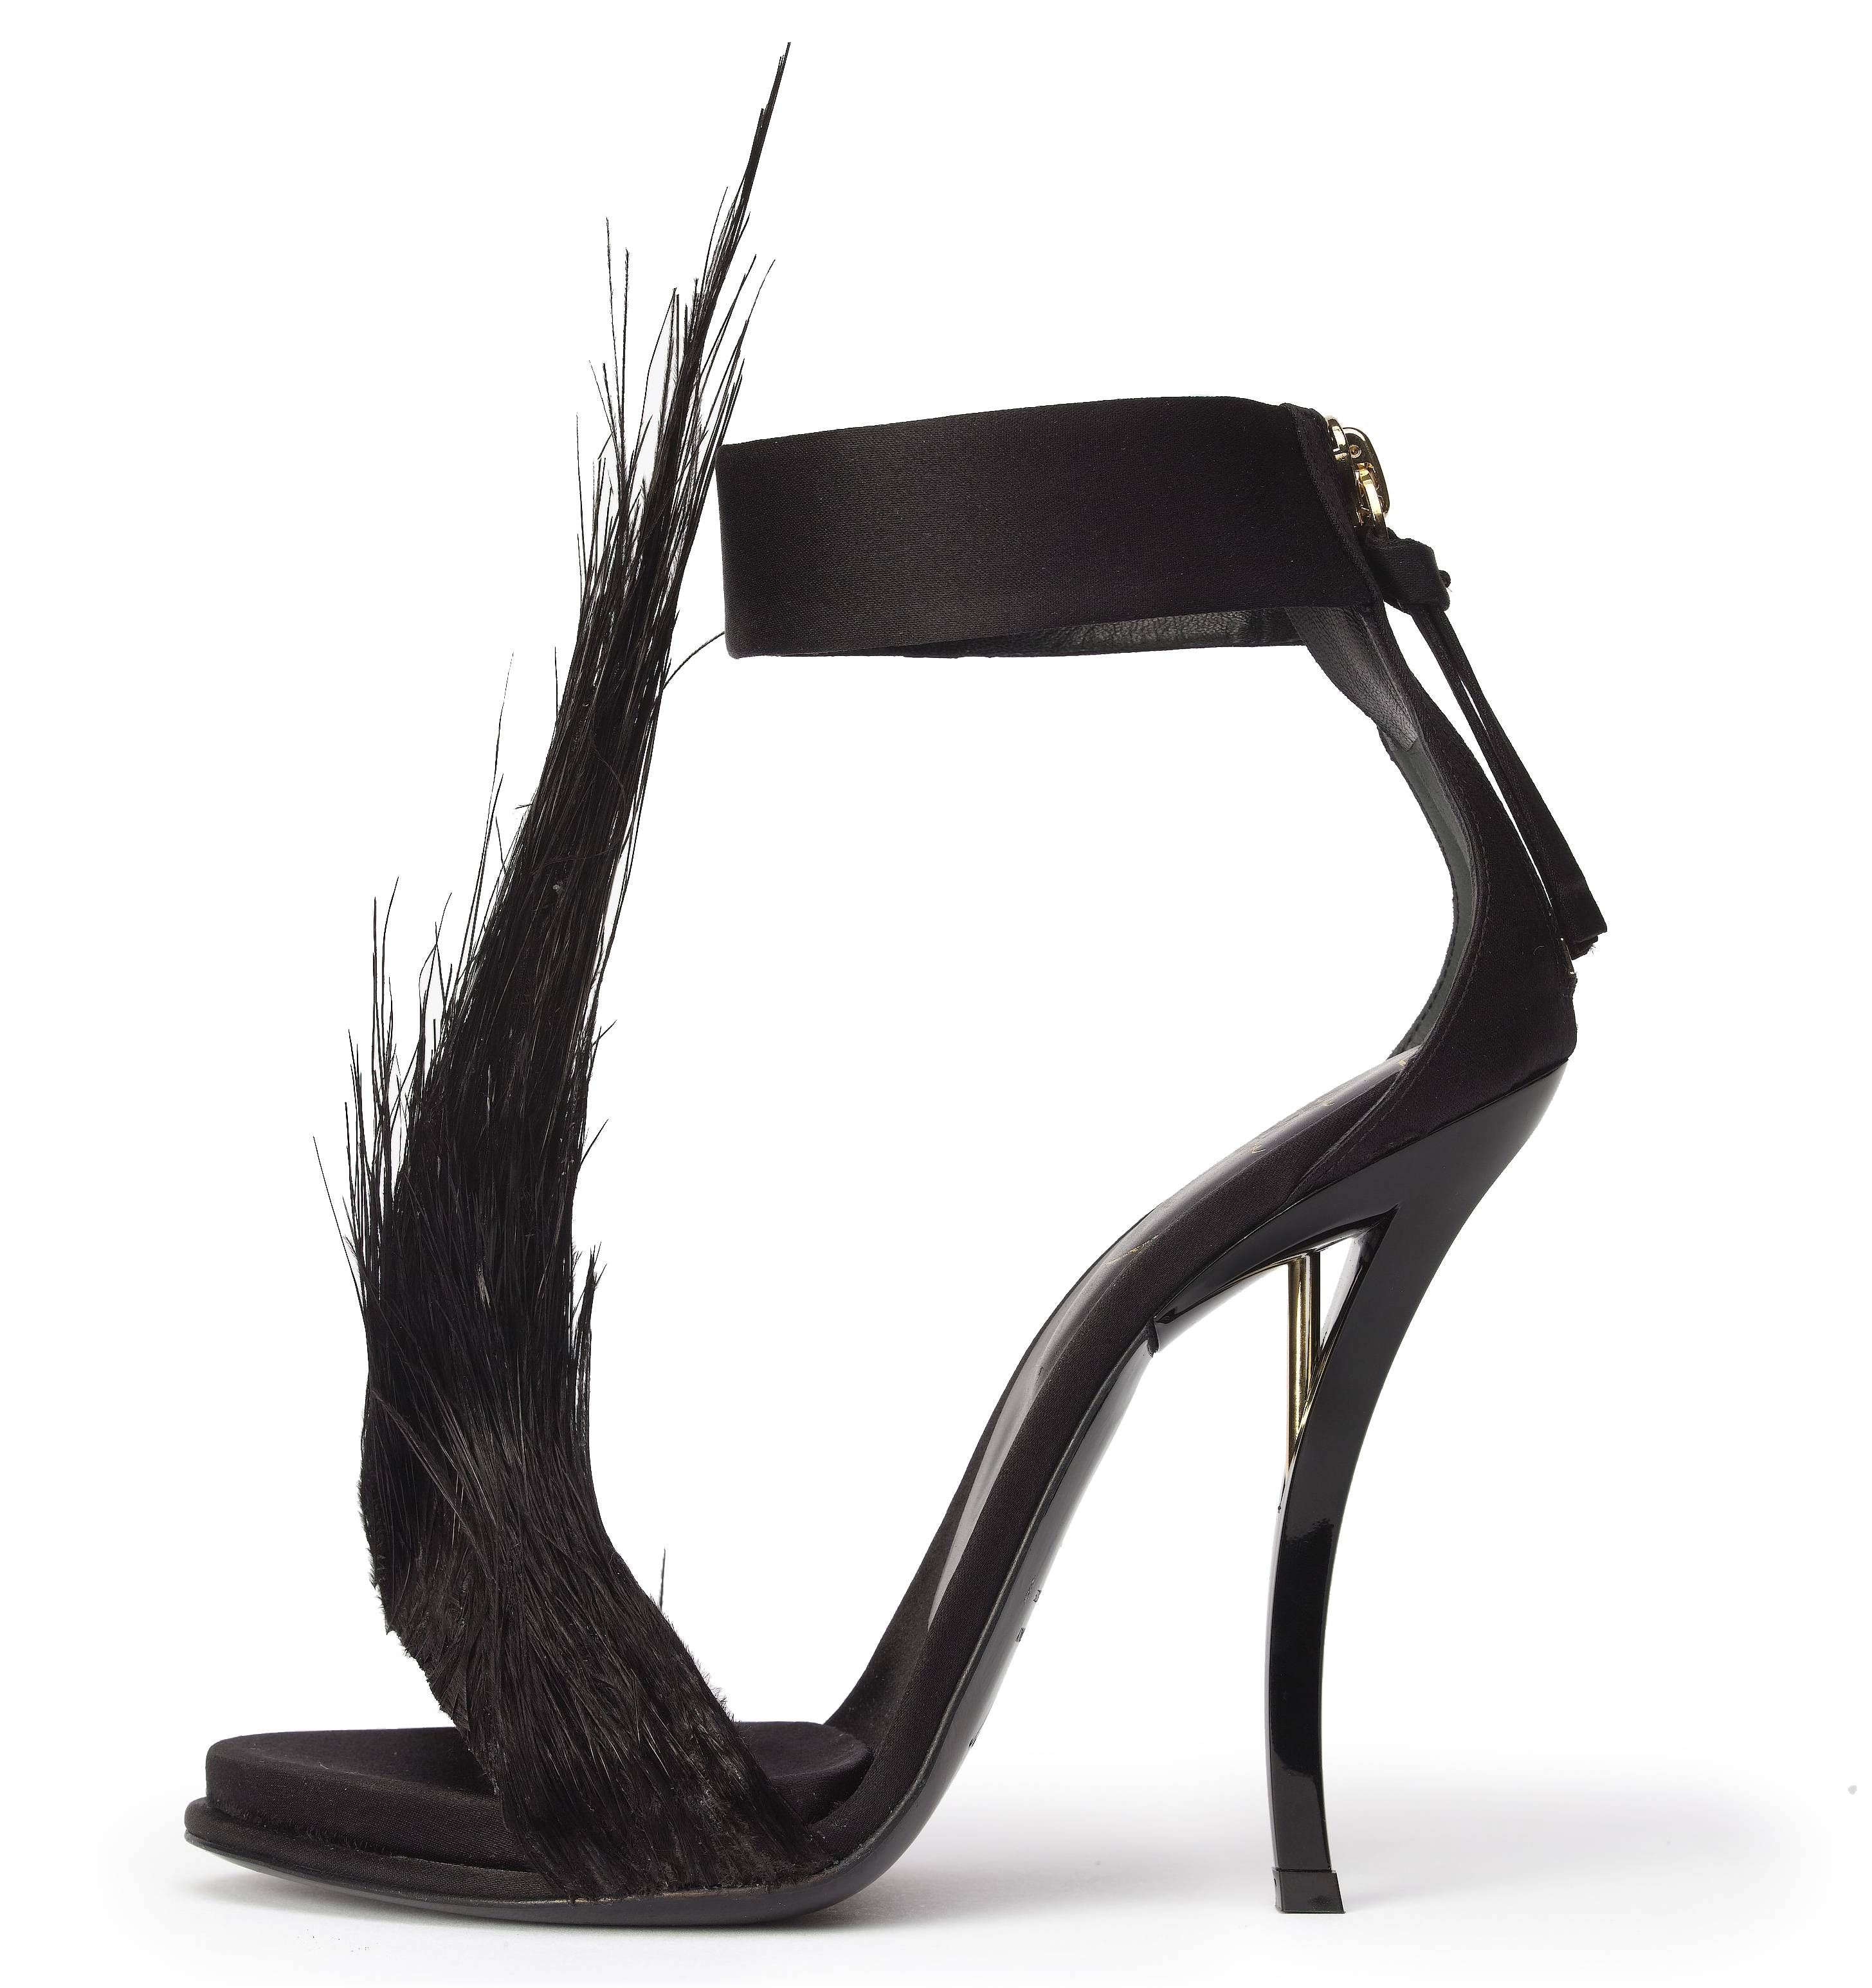 Swanned sandal